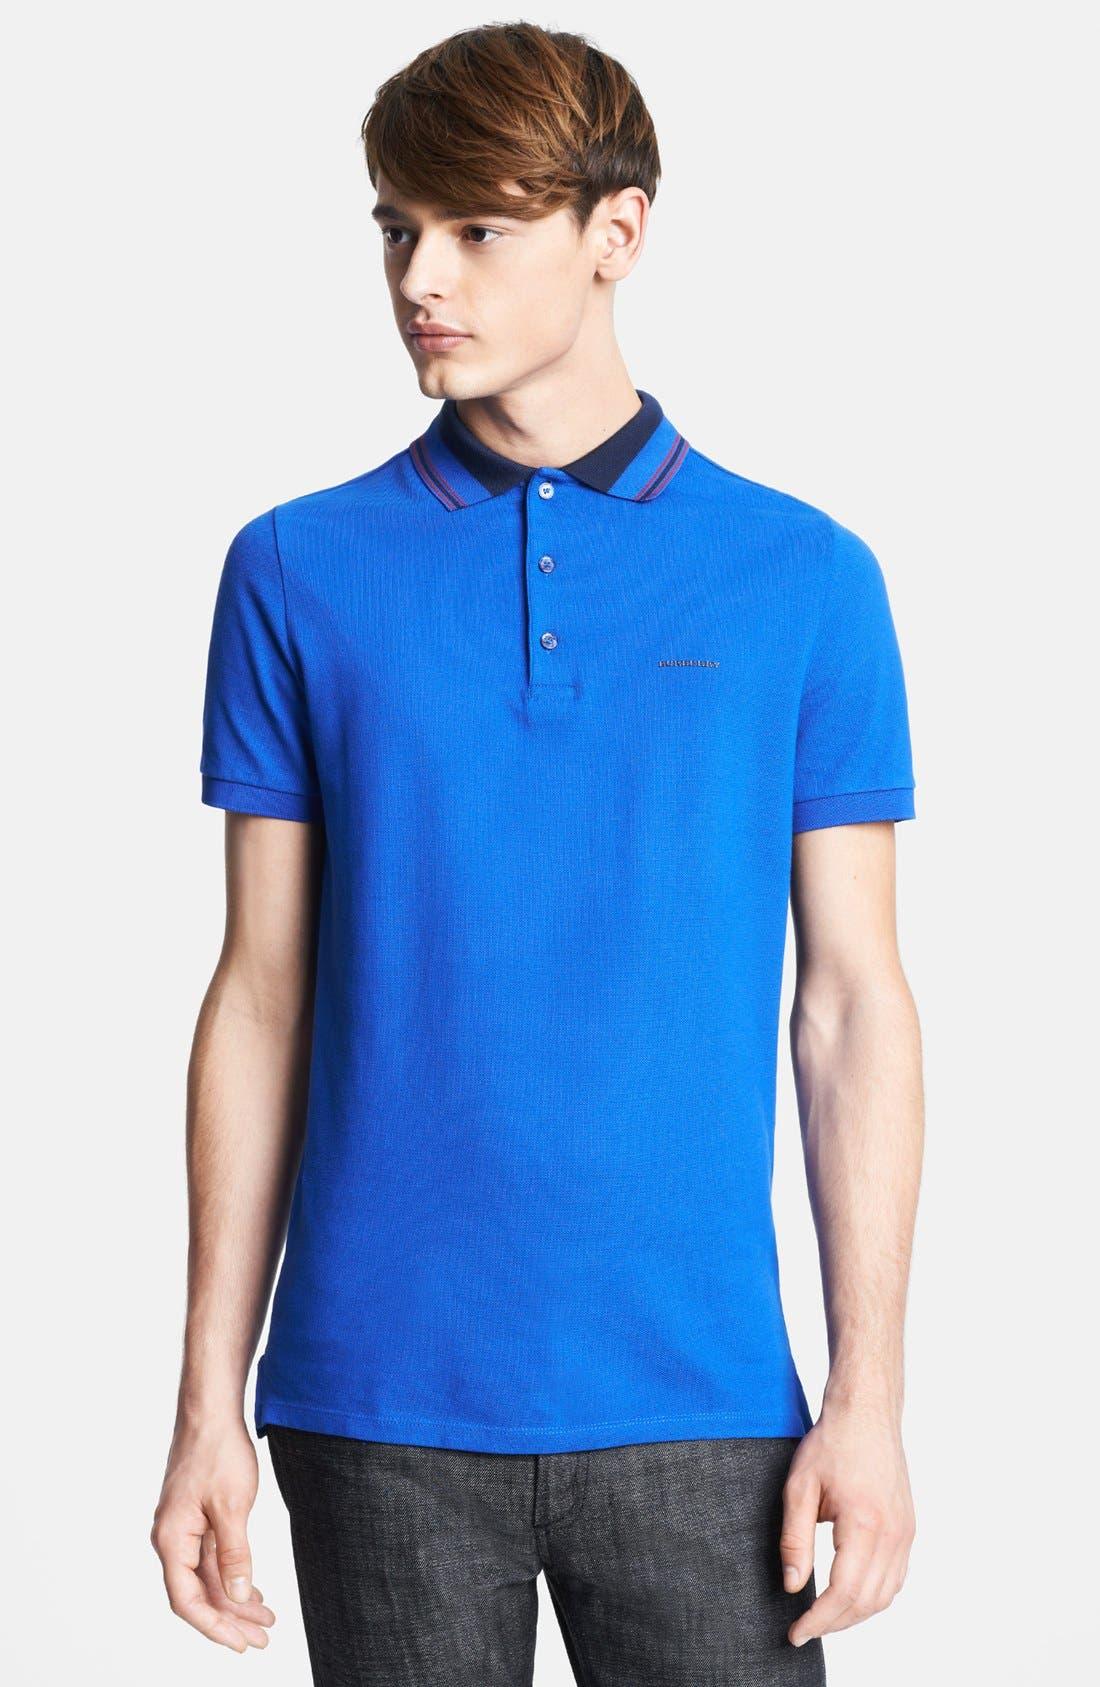 London 'Adler' Check Placket Cotton Polo,                             Main thumbnail 1, color,                             Bright Blue